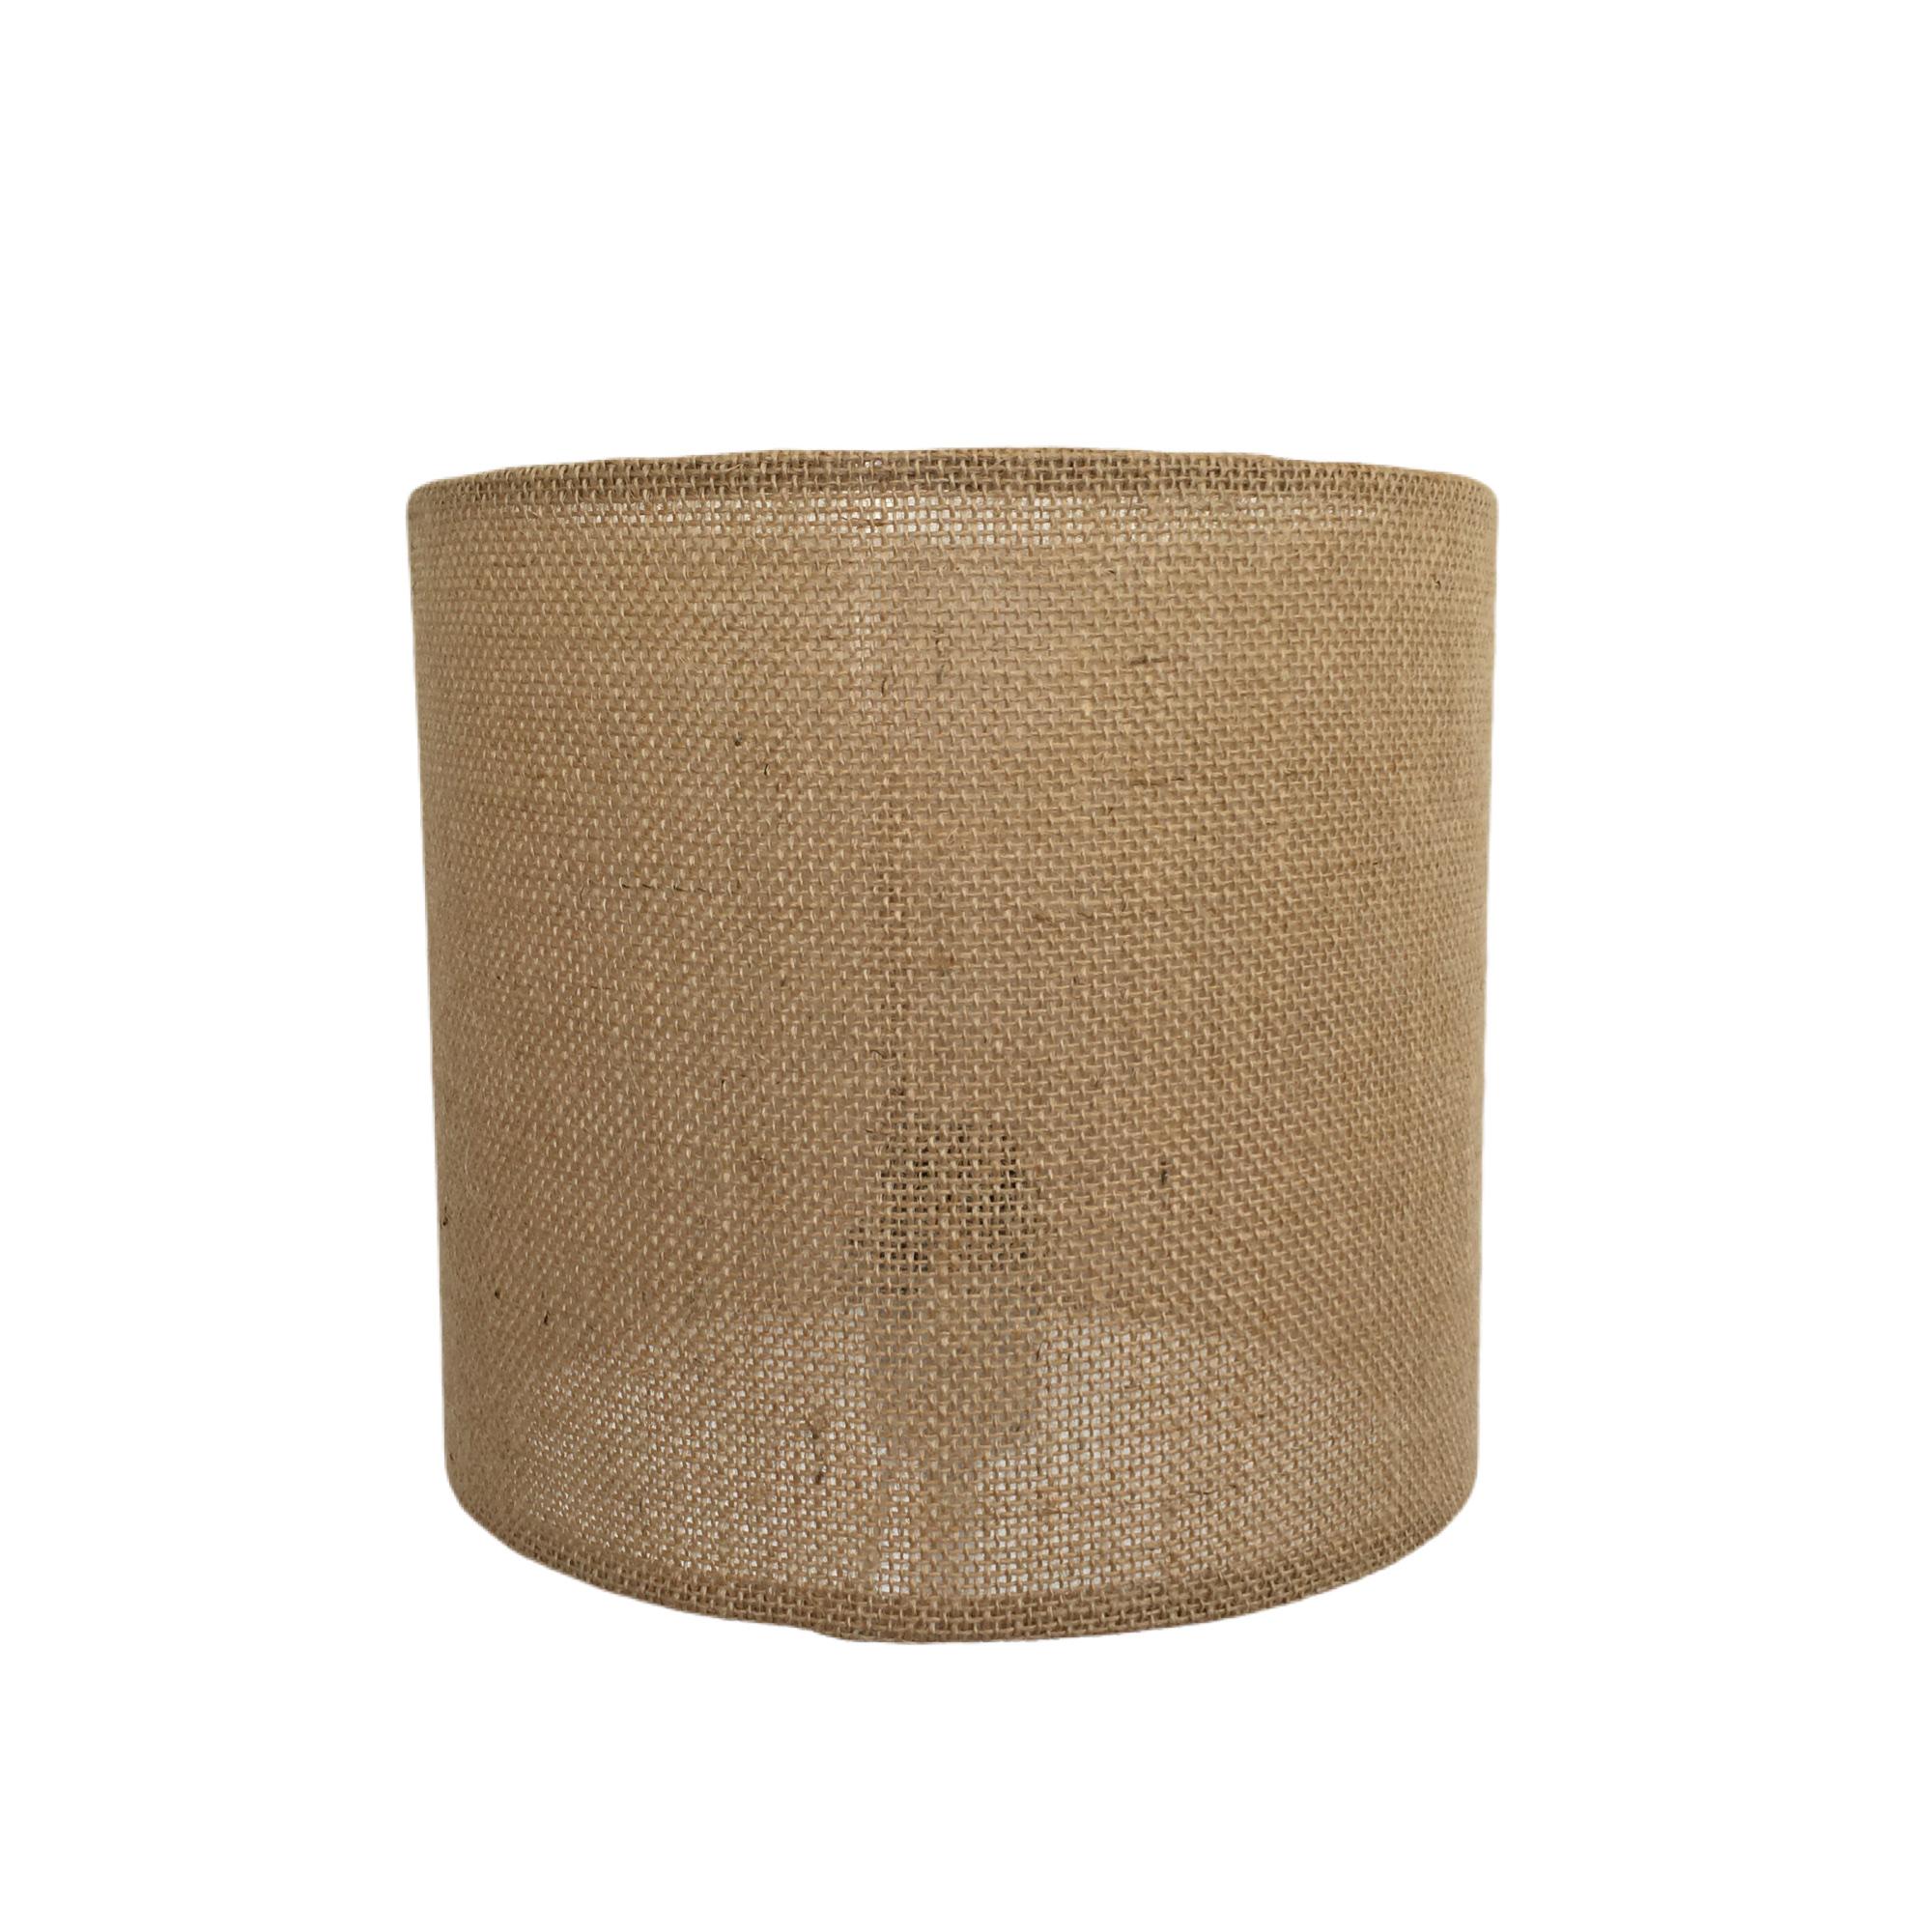 Suspension toile de jute diamètre 35 cm